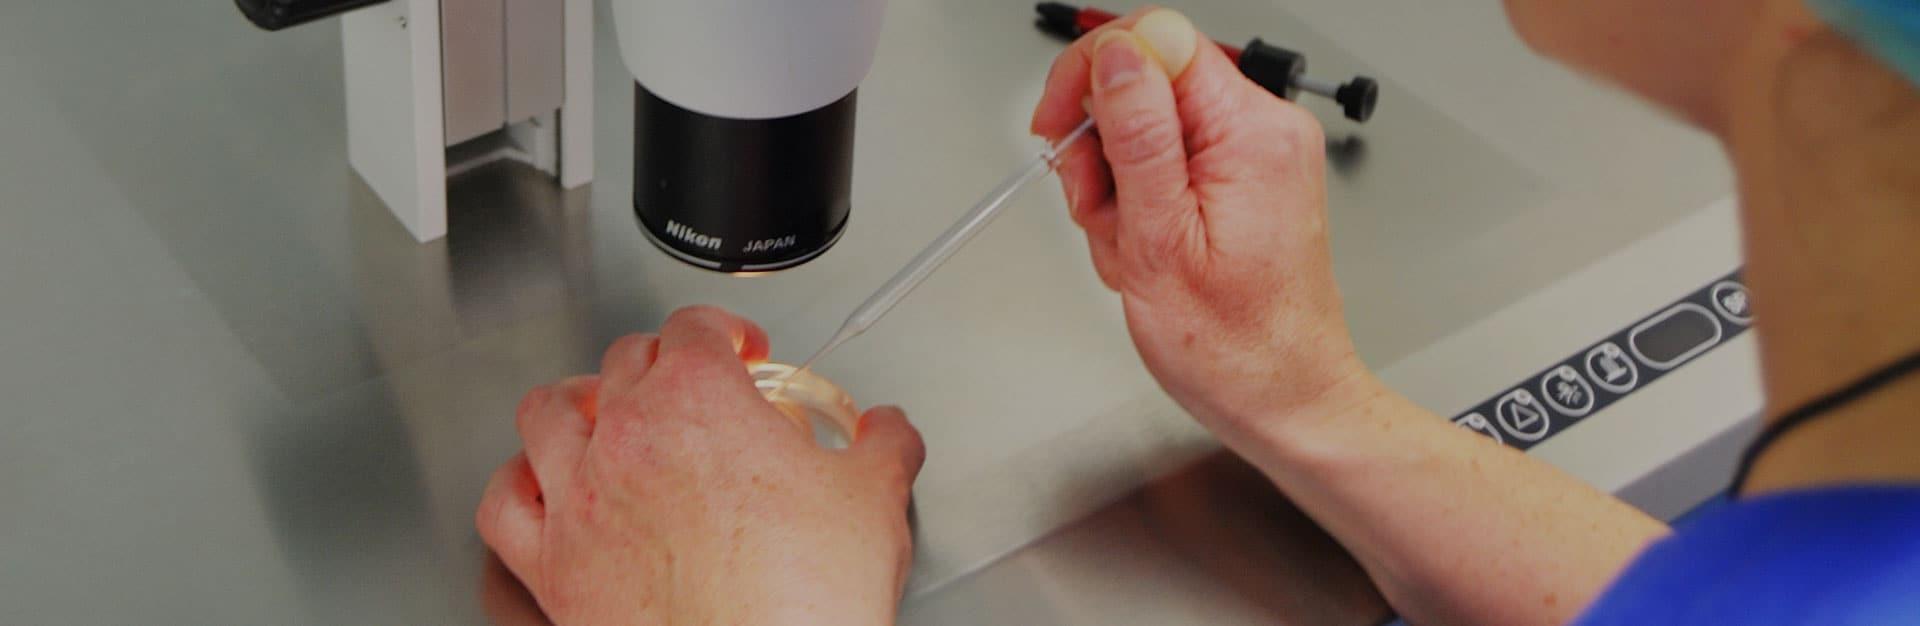 slider reproduccion asistida clínica ginecológica elcano7. Bilbao